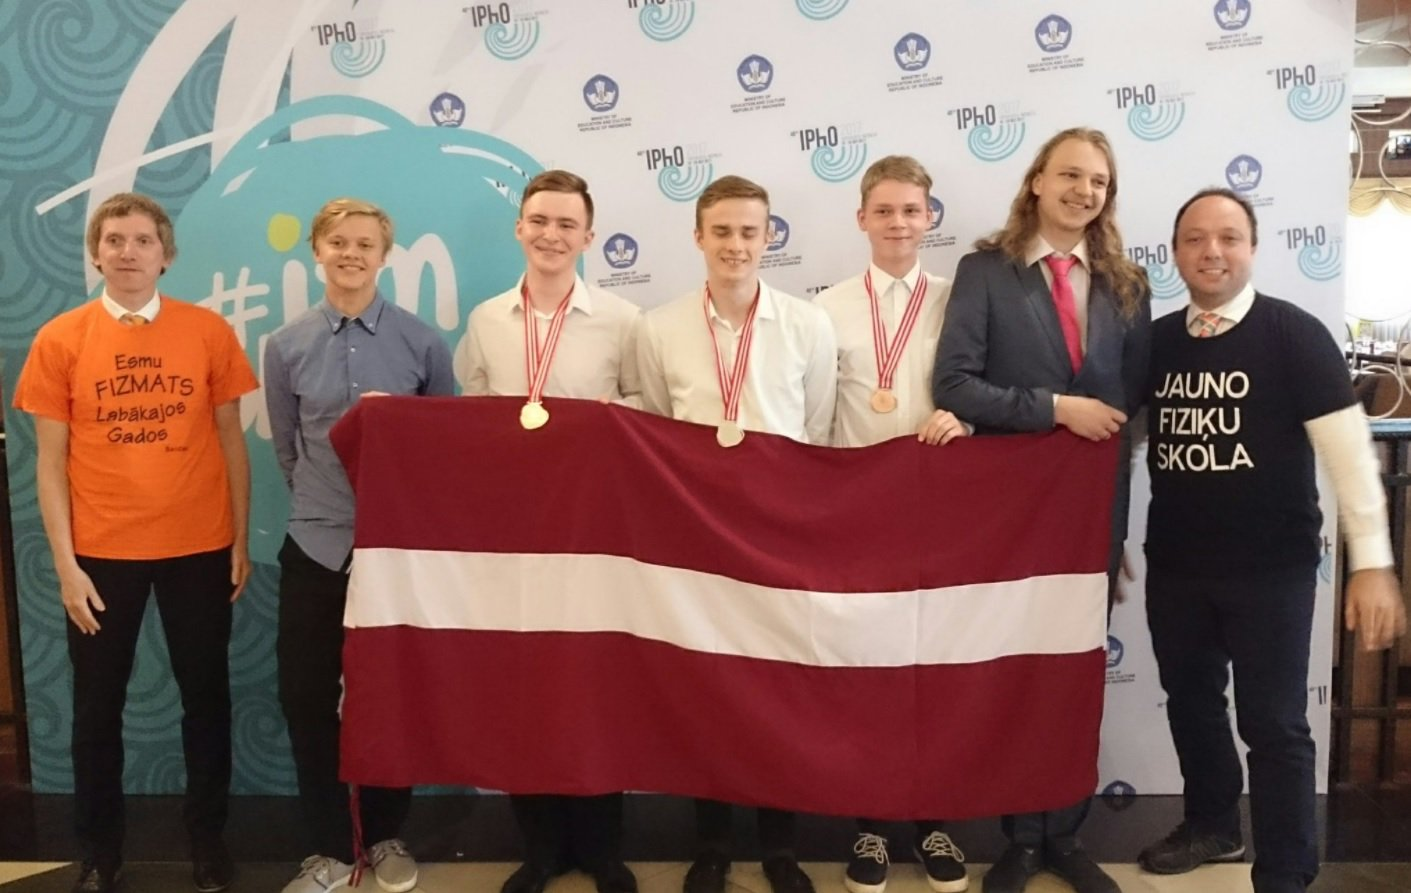 IPhO 2017 team LV